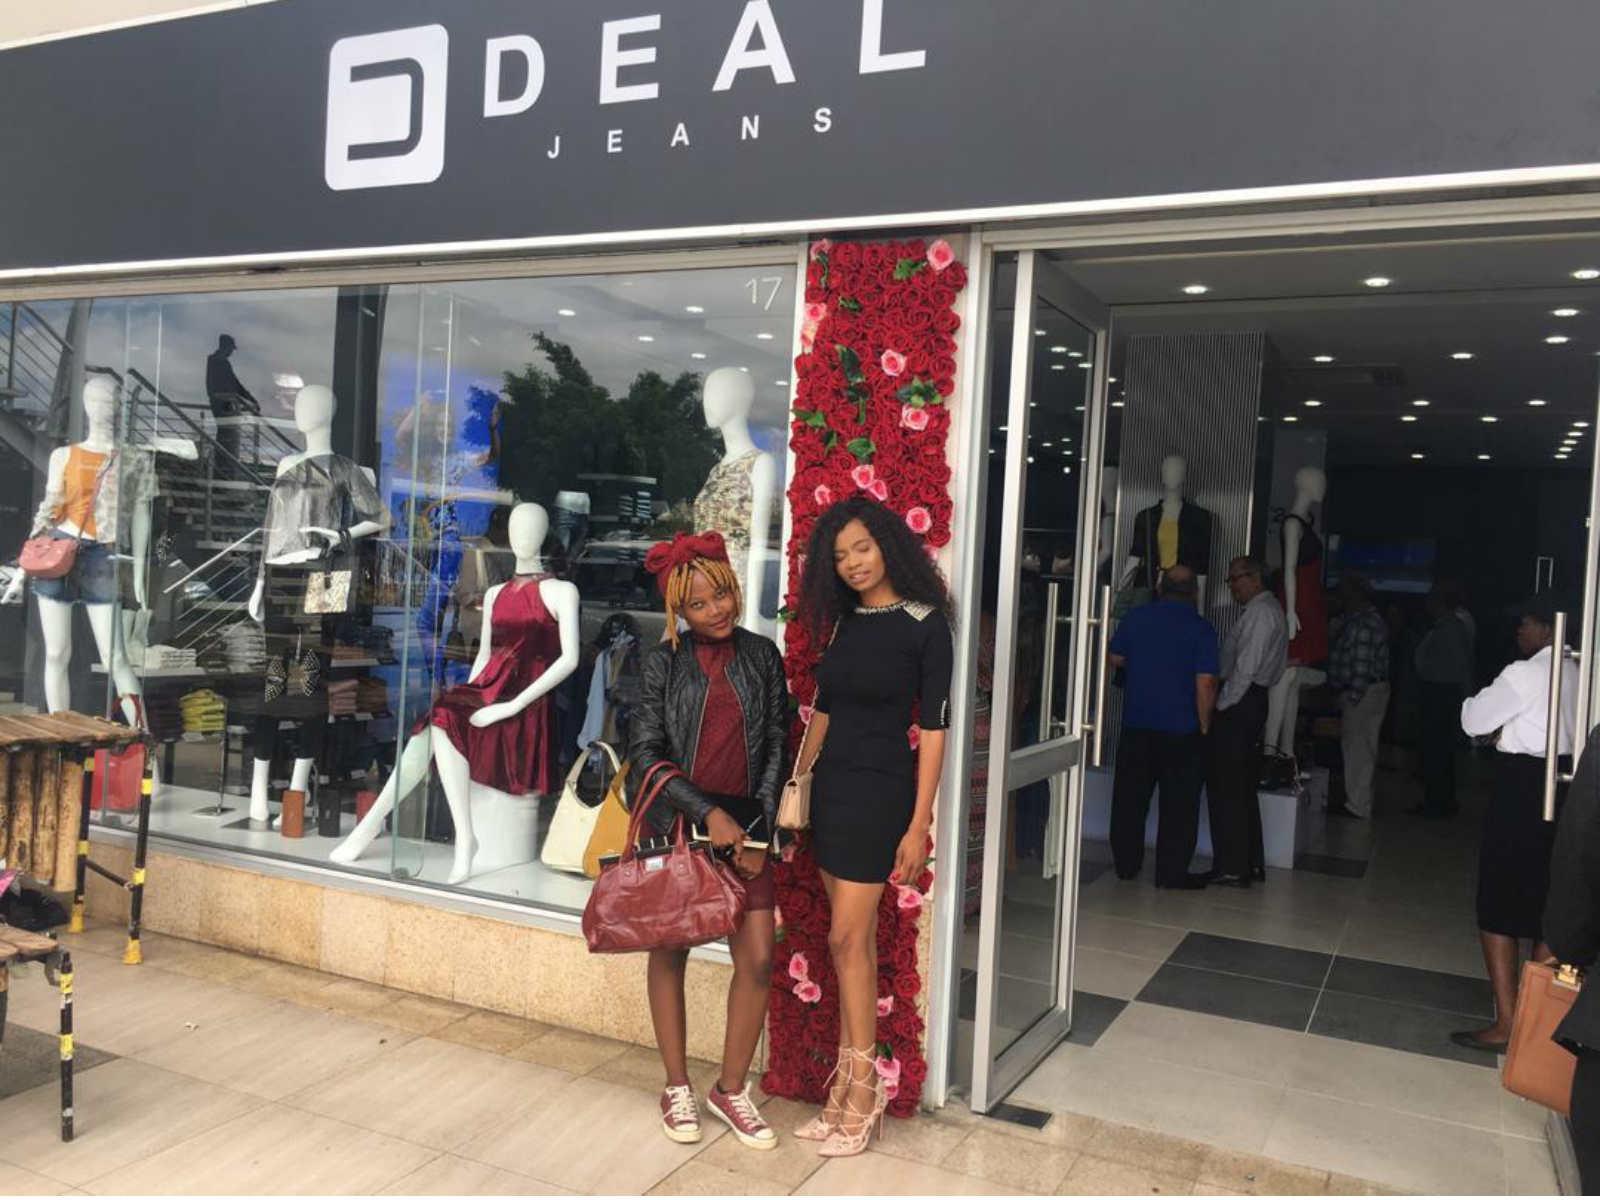 Deal Jeans Gaborone sebele centre